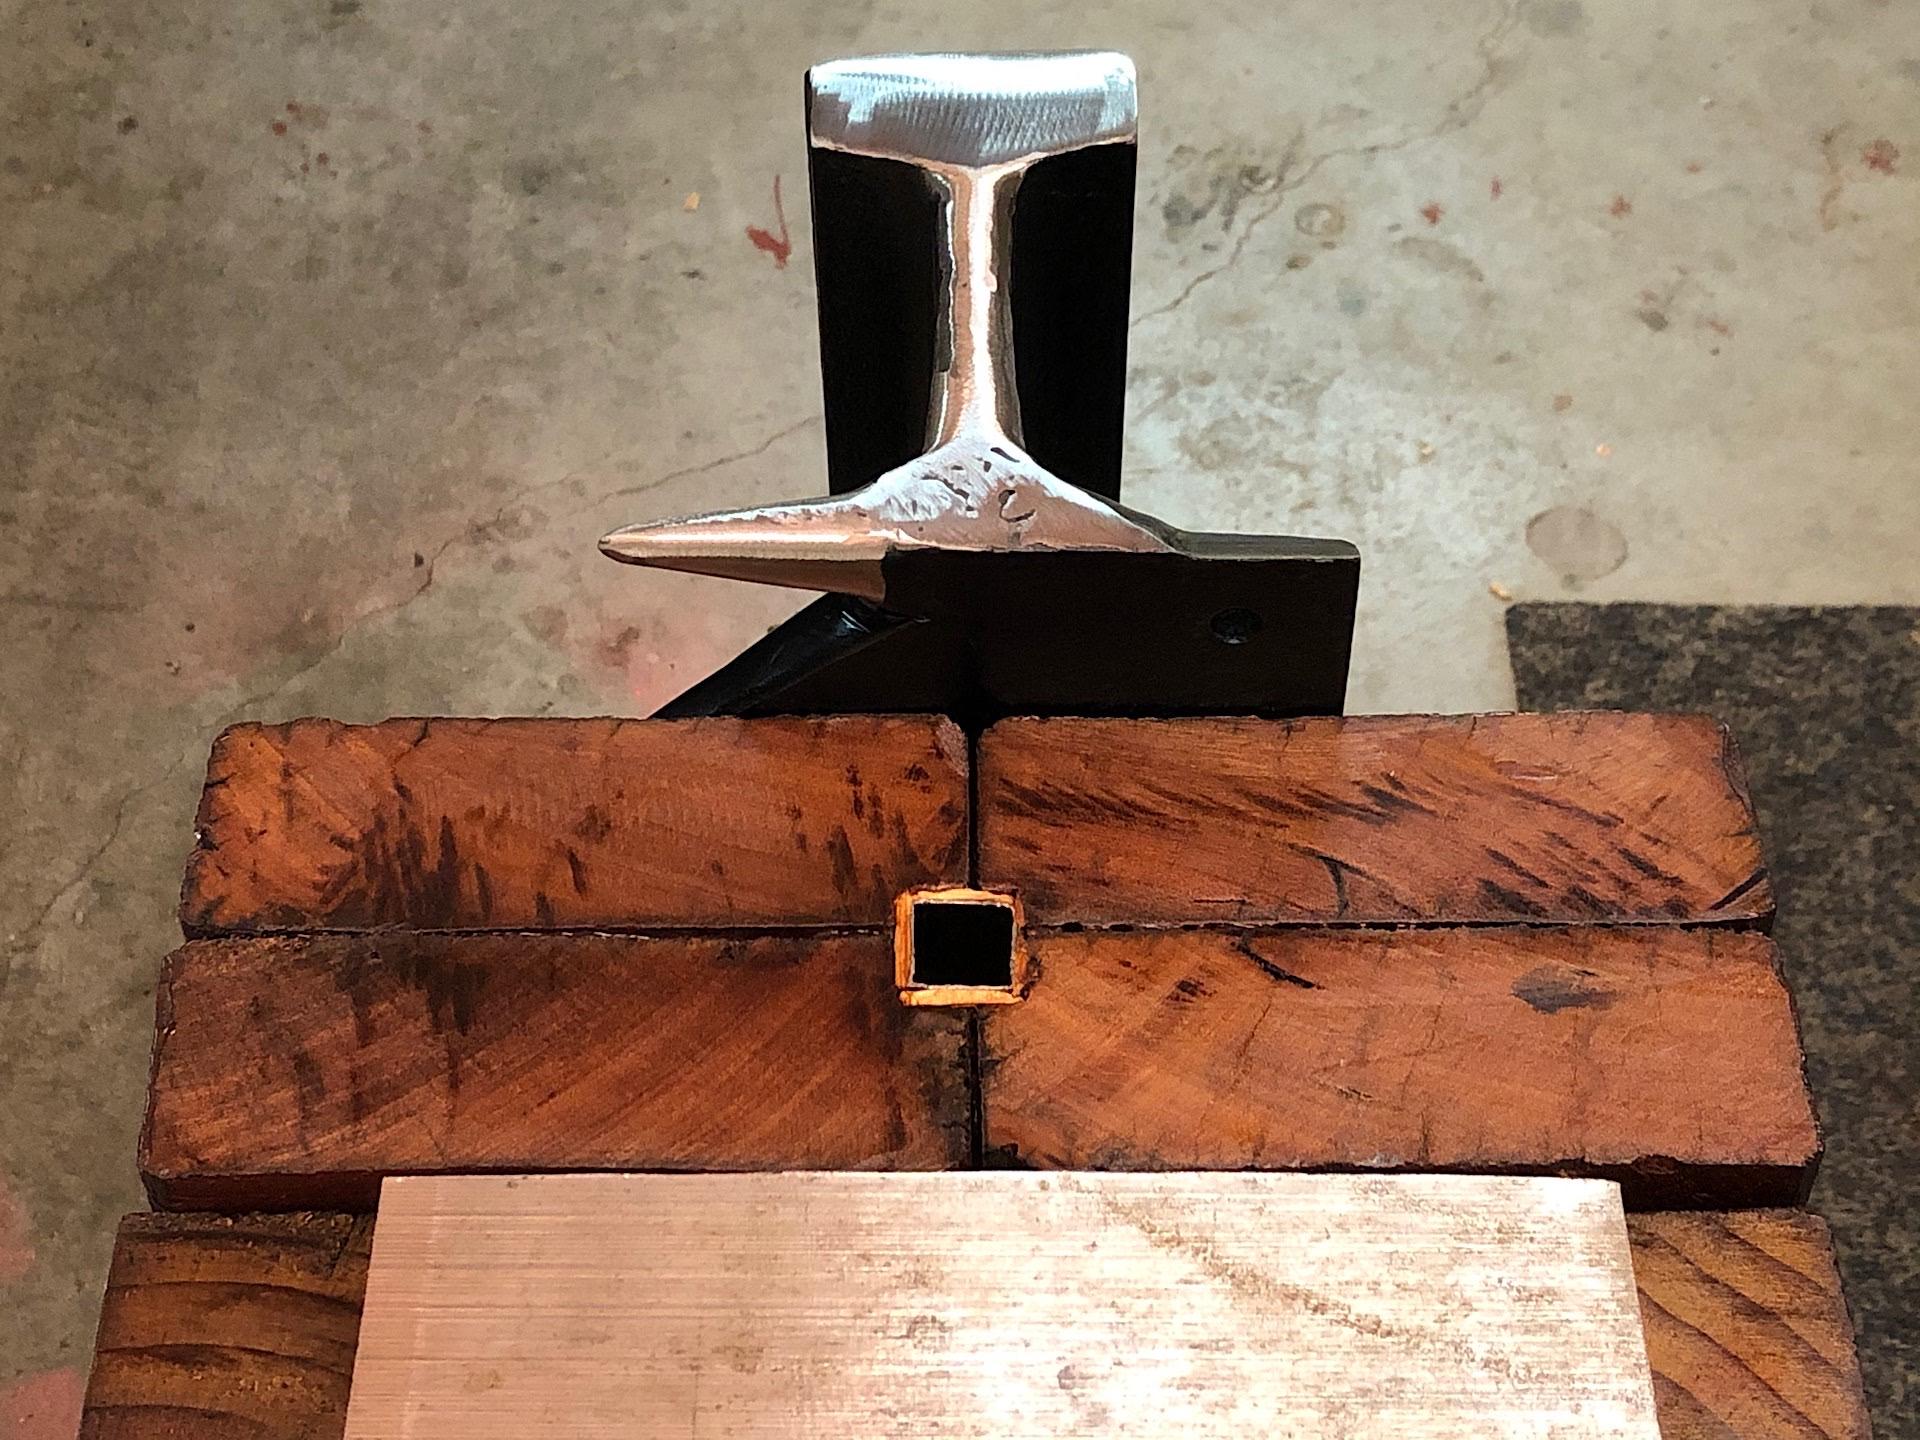 Rear view of my DIY rail anvil